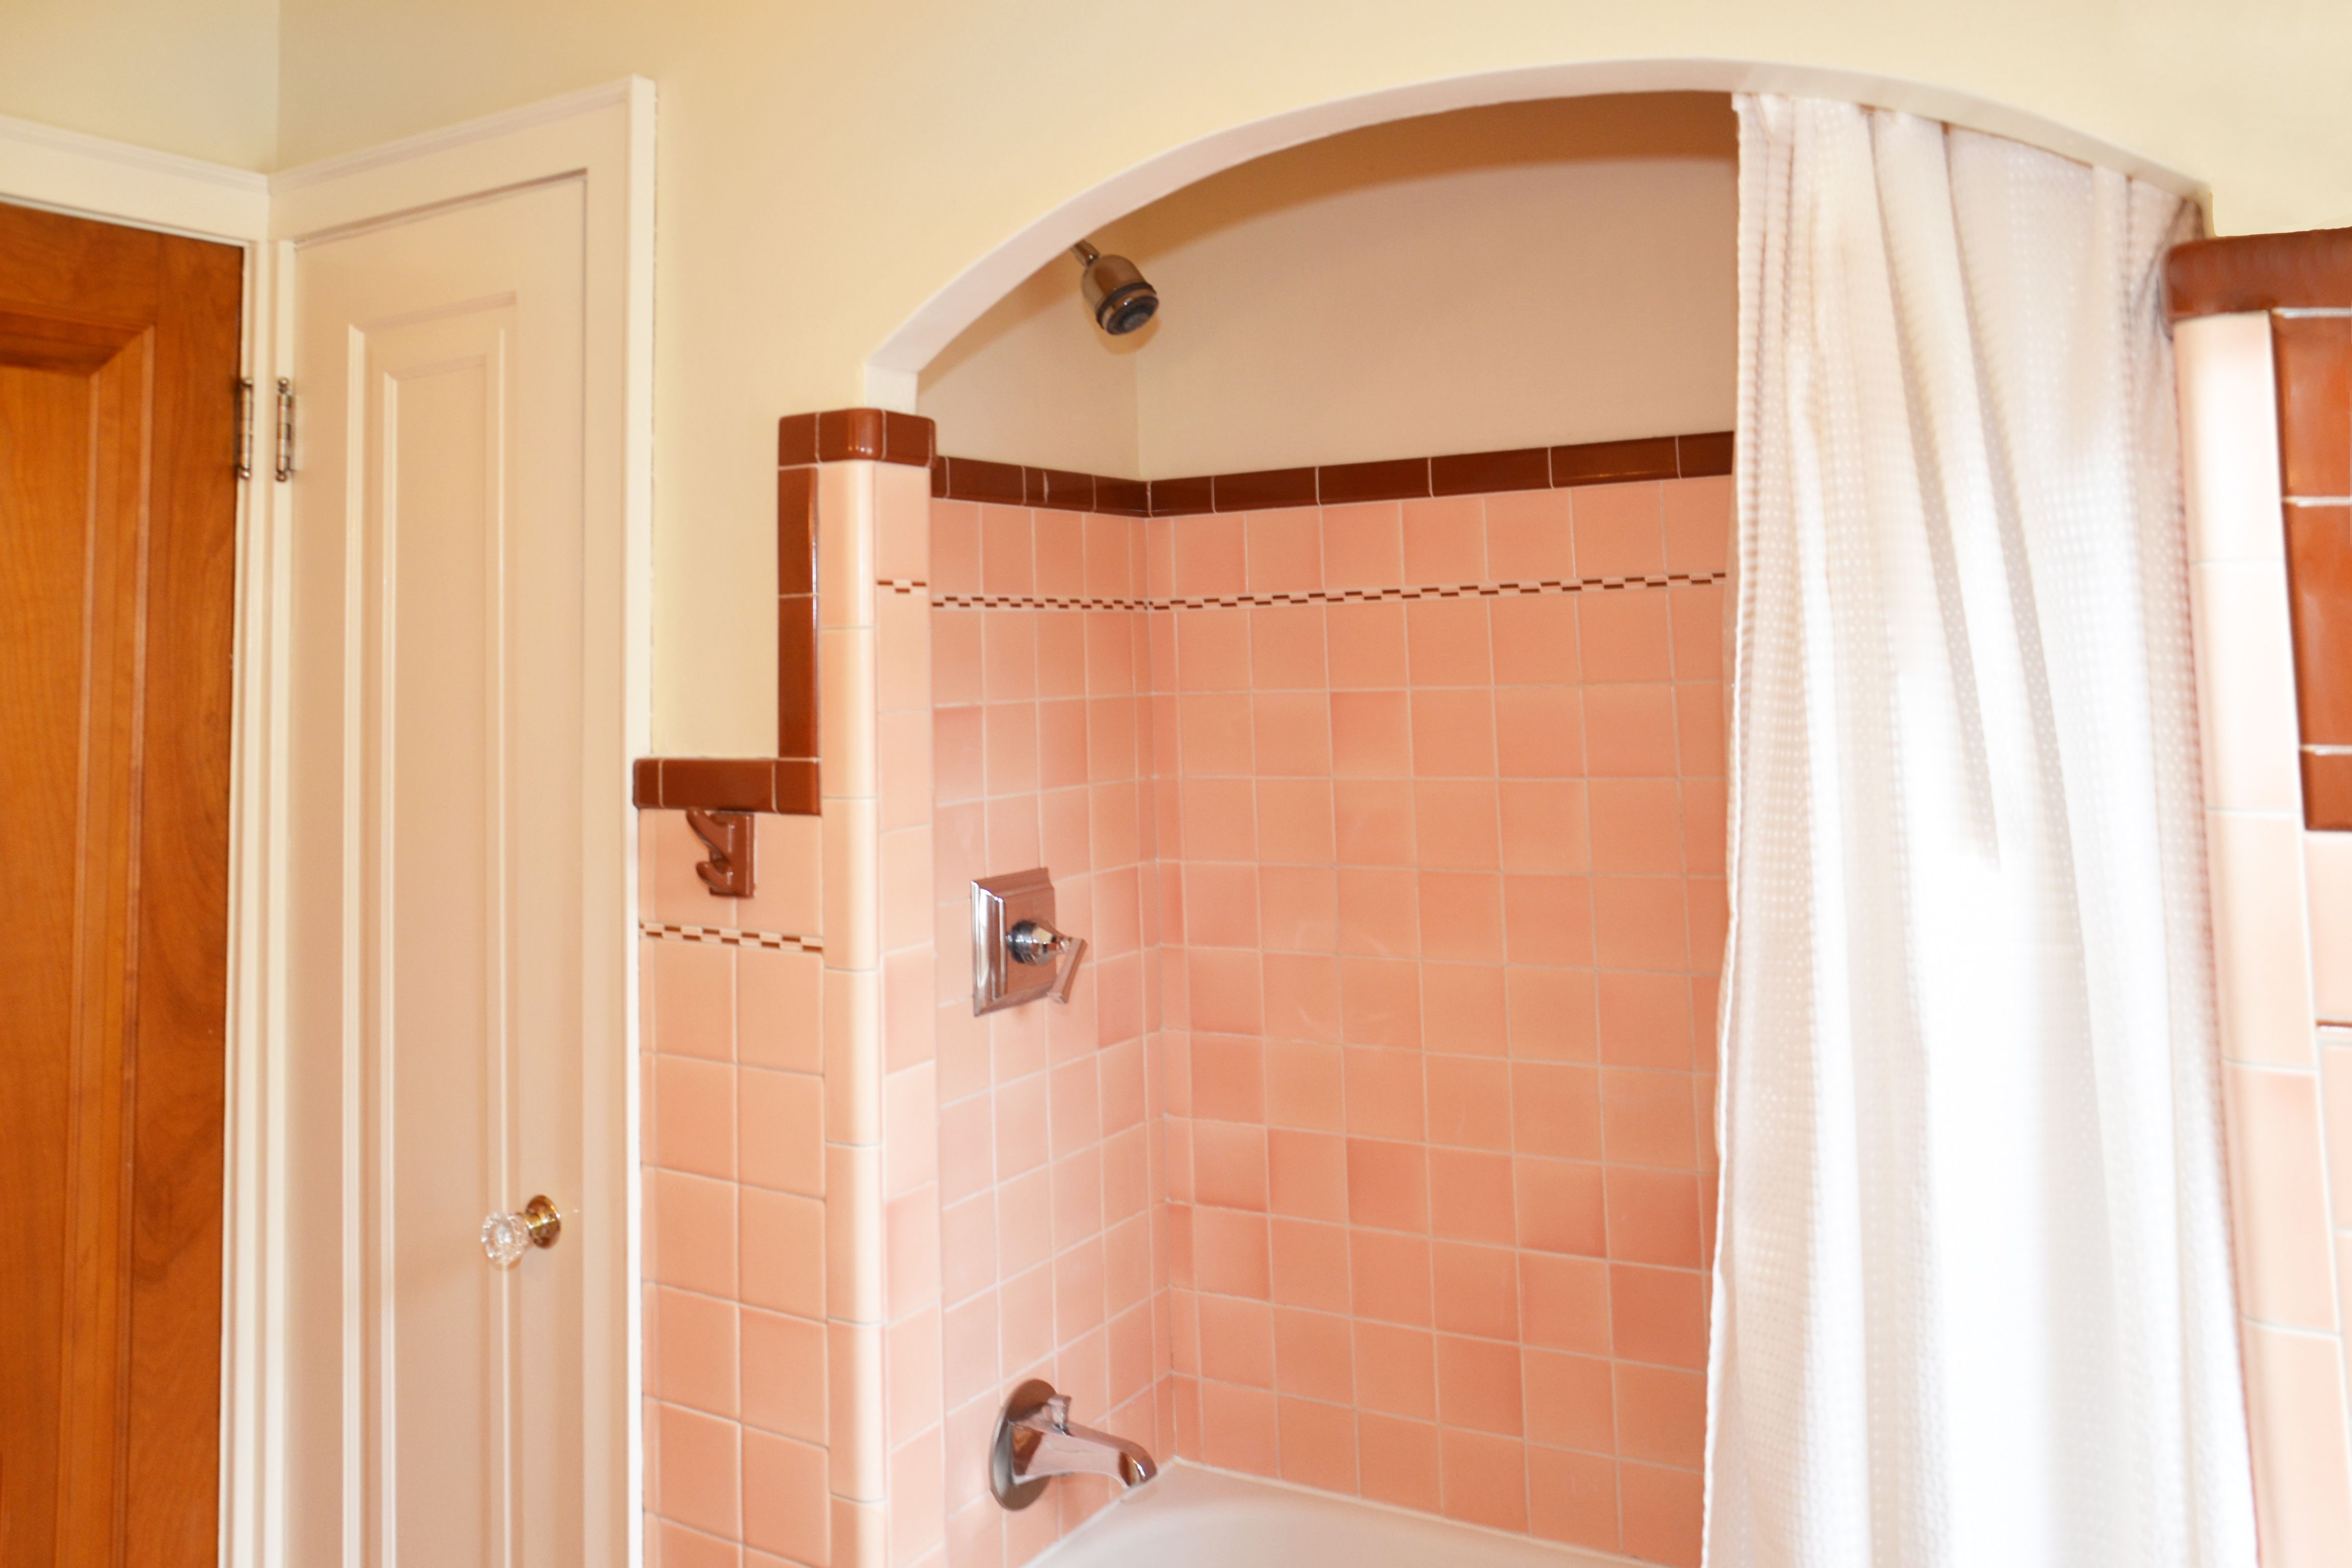 Ceramic bathroom tile acquerelli shower fixtures for sale too - Curved Shower Alcove